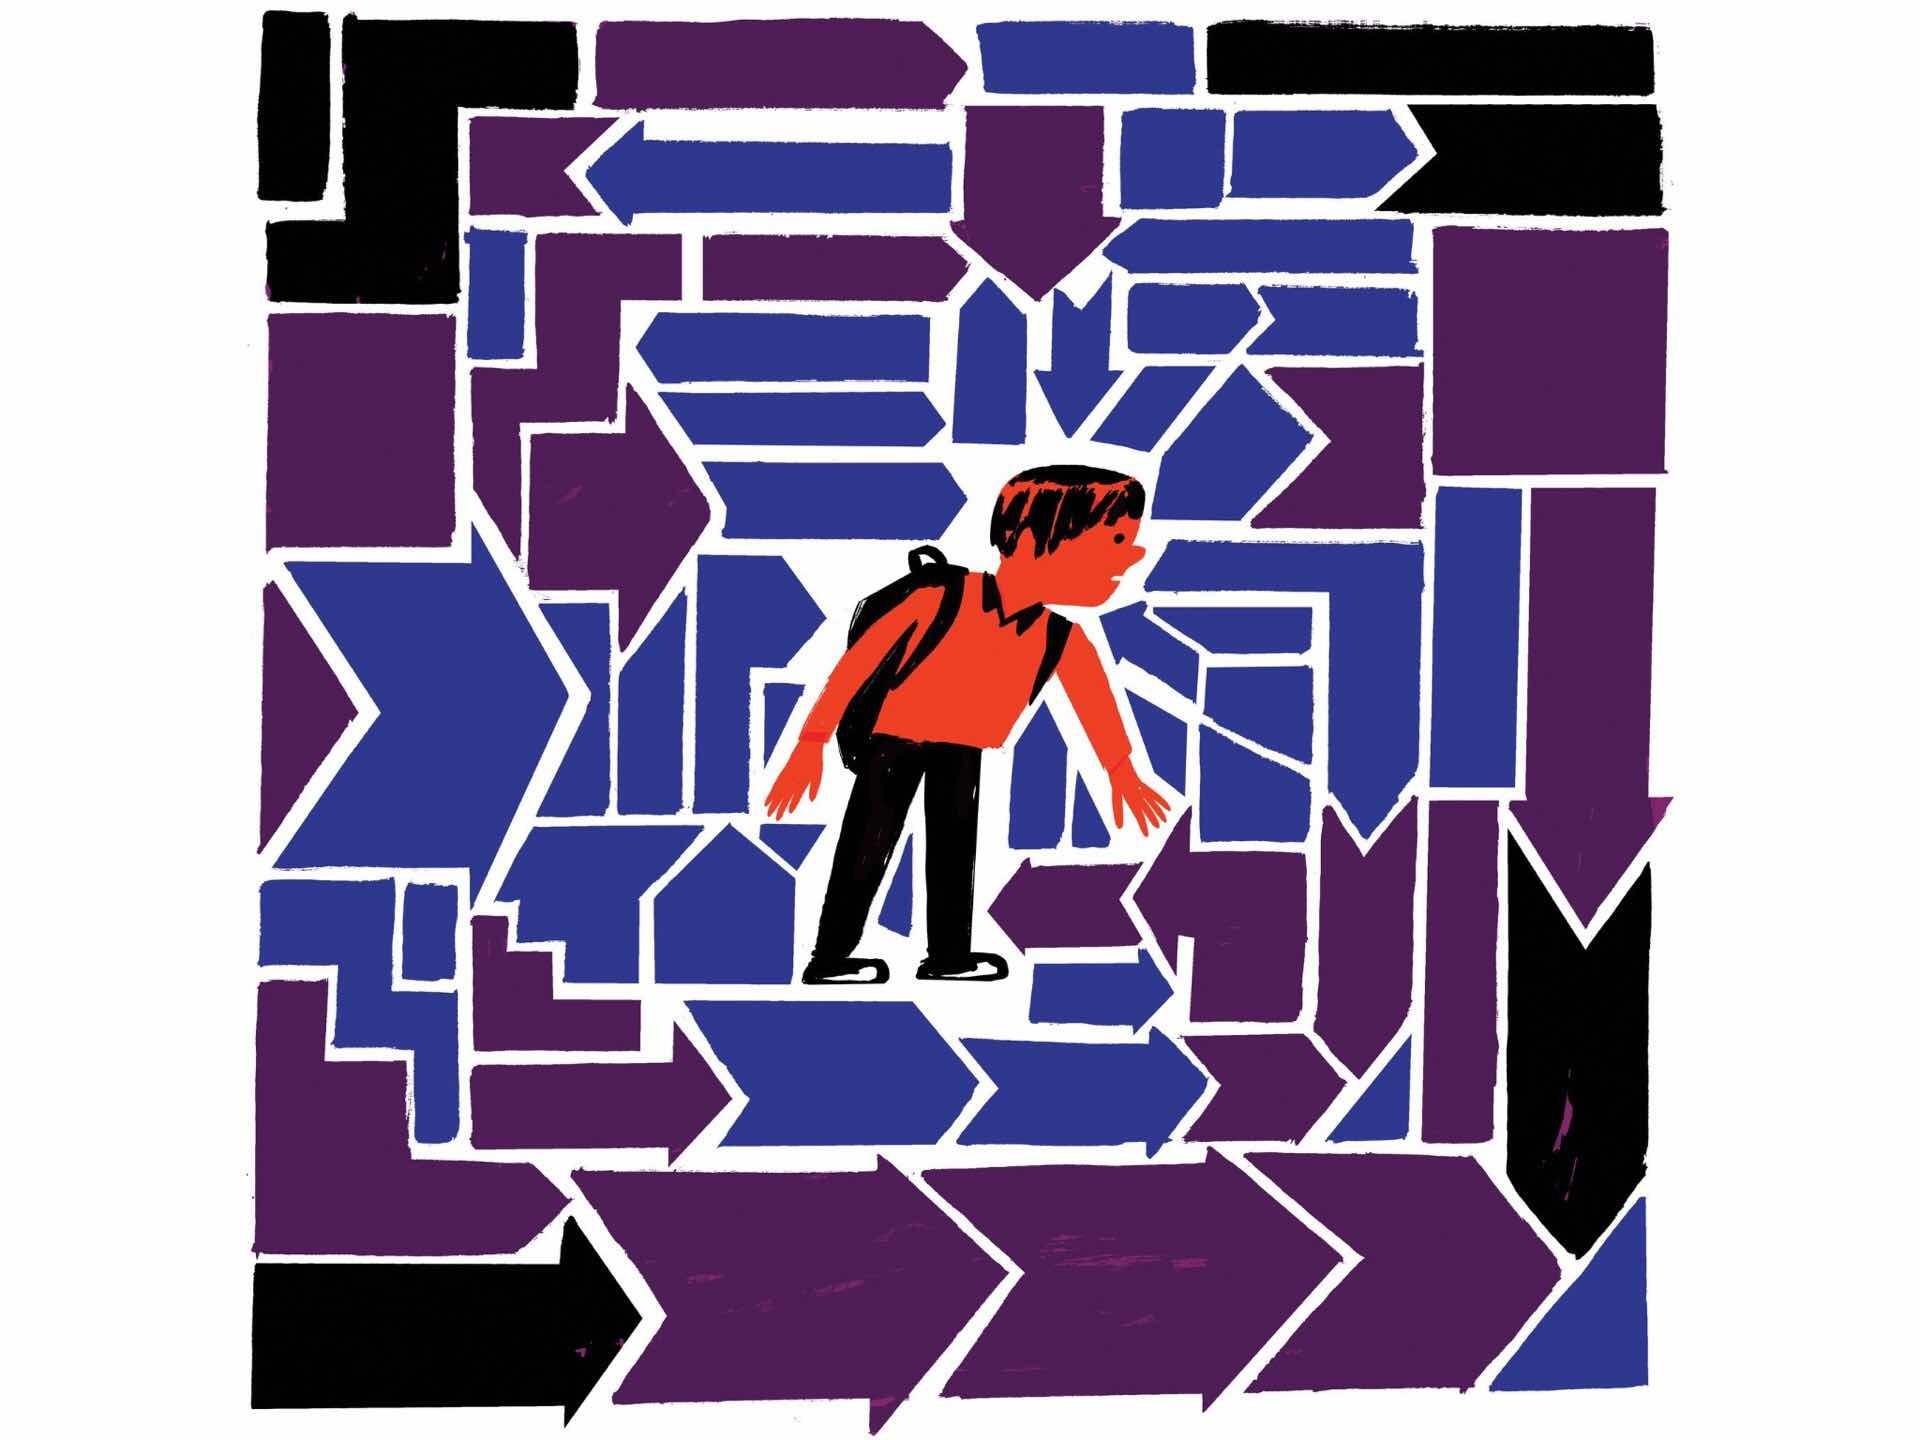 Illustration: João Fazenda for The New York Times